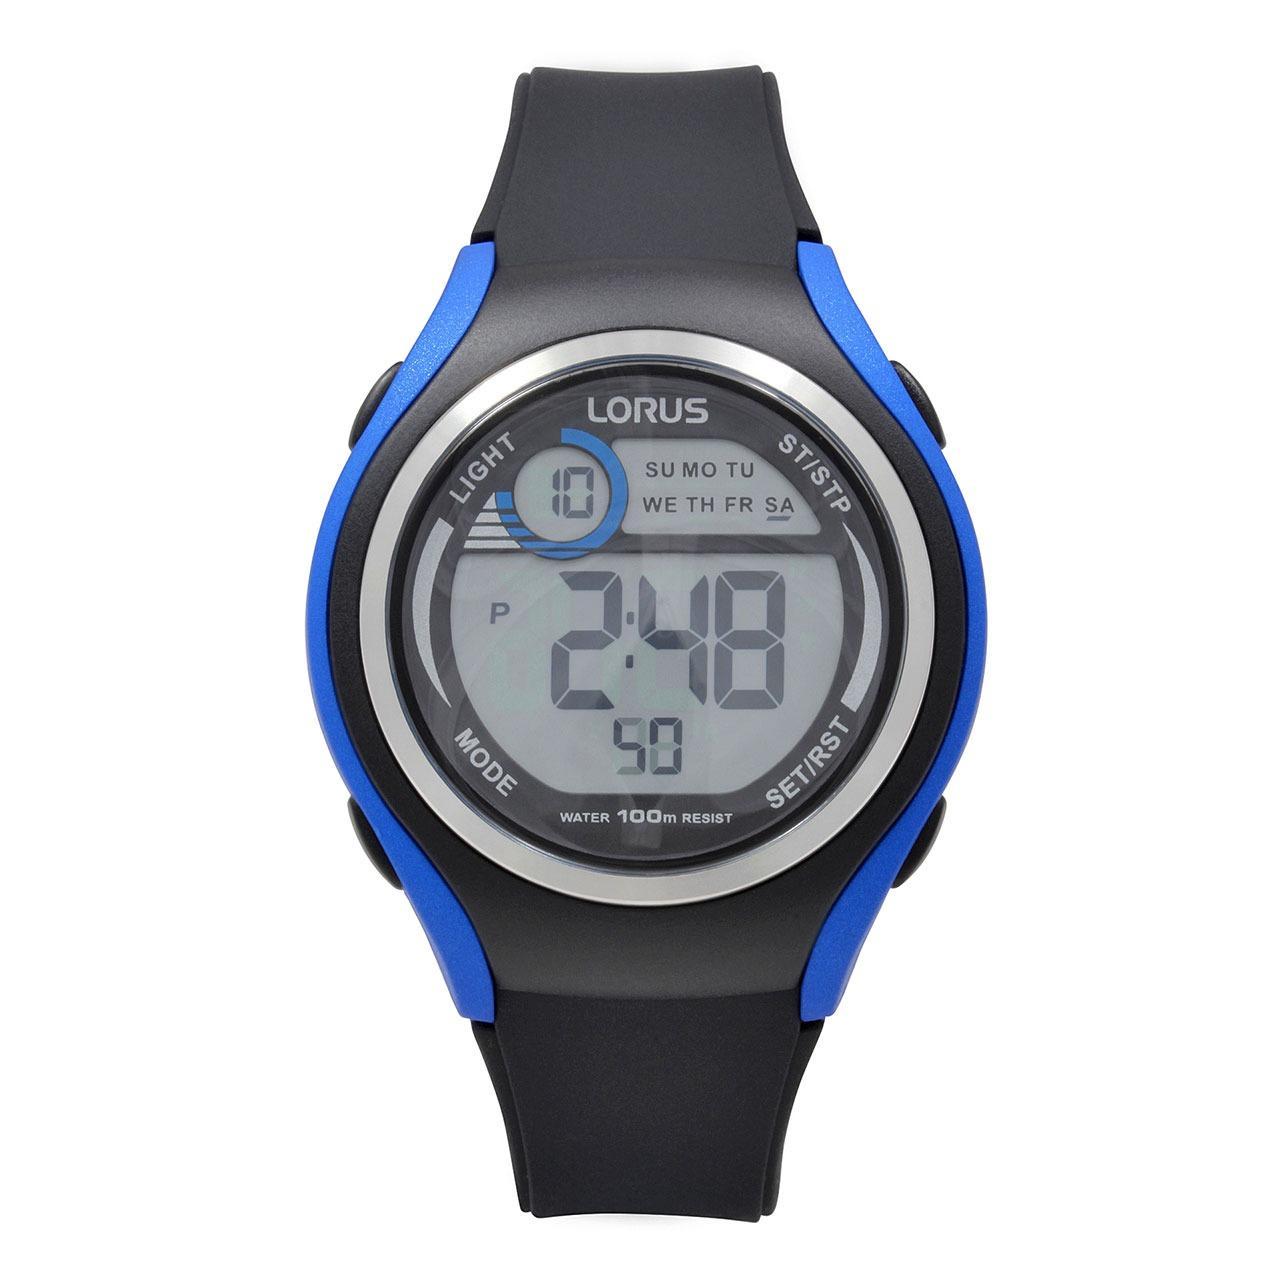 LORUS Jam Tangan - Black Blue - Silicon - R2377LX9